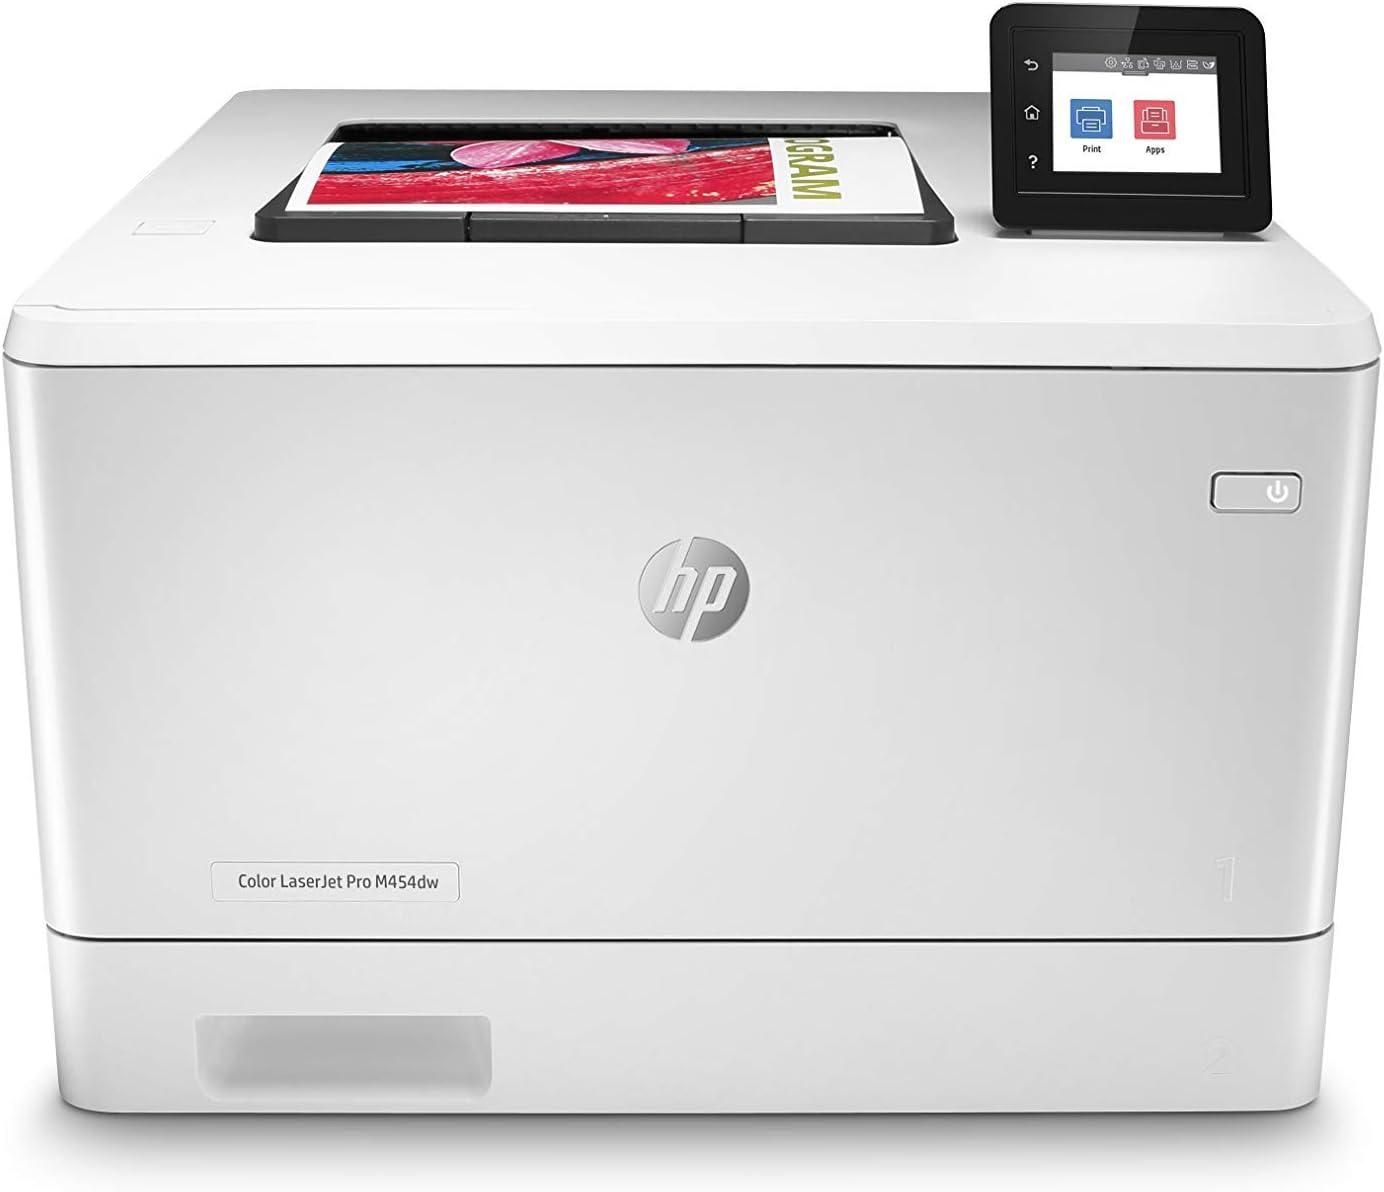 HP Color LaserJet Pro M454dw Printer (W1Y45A) (Renewed)